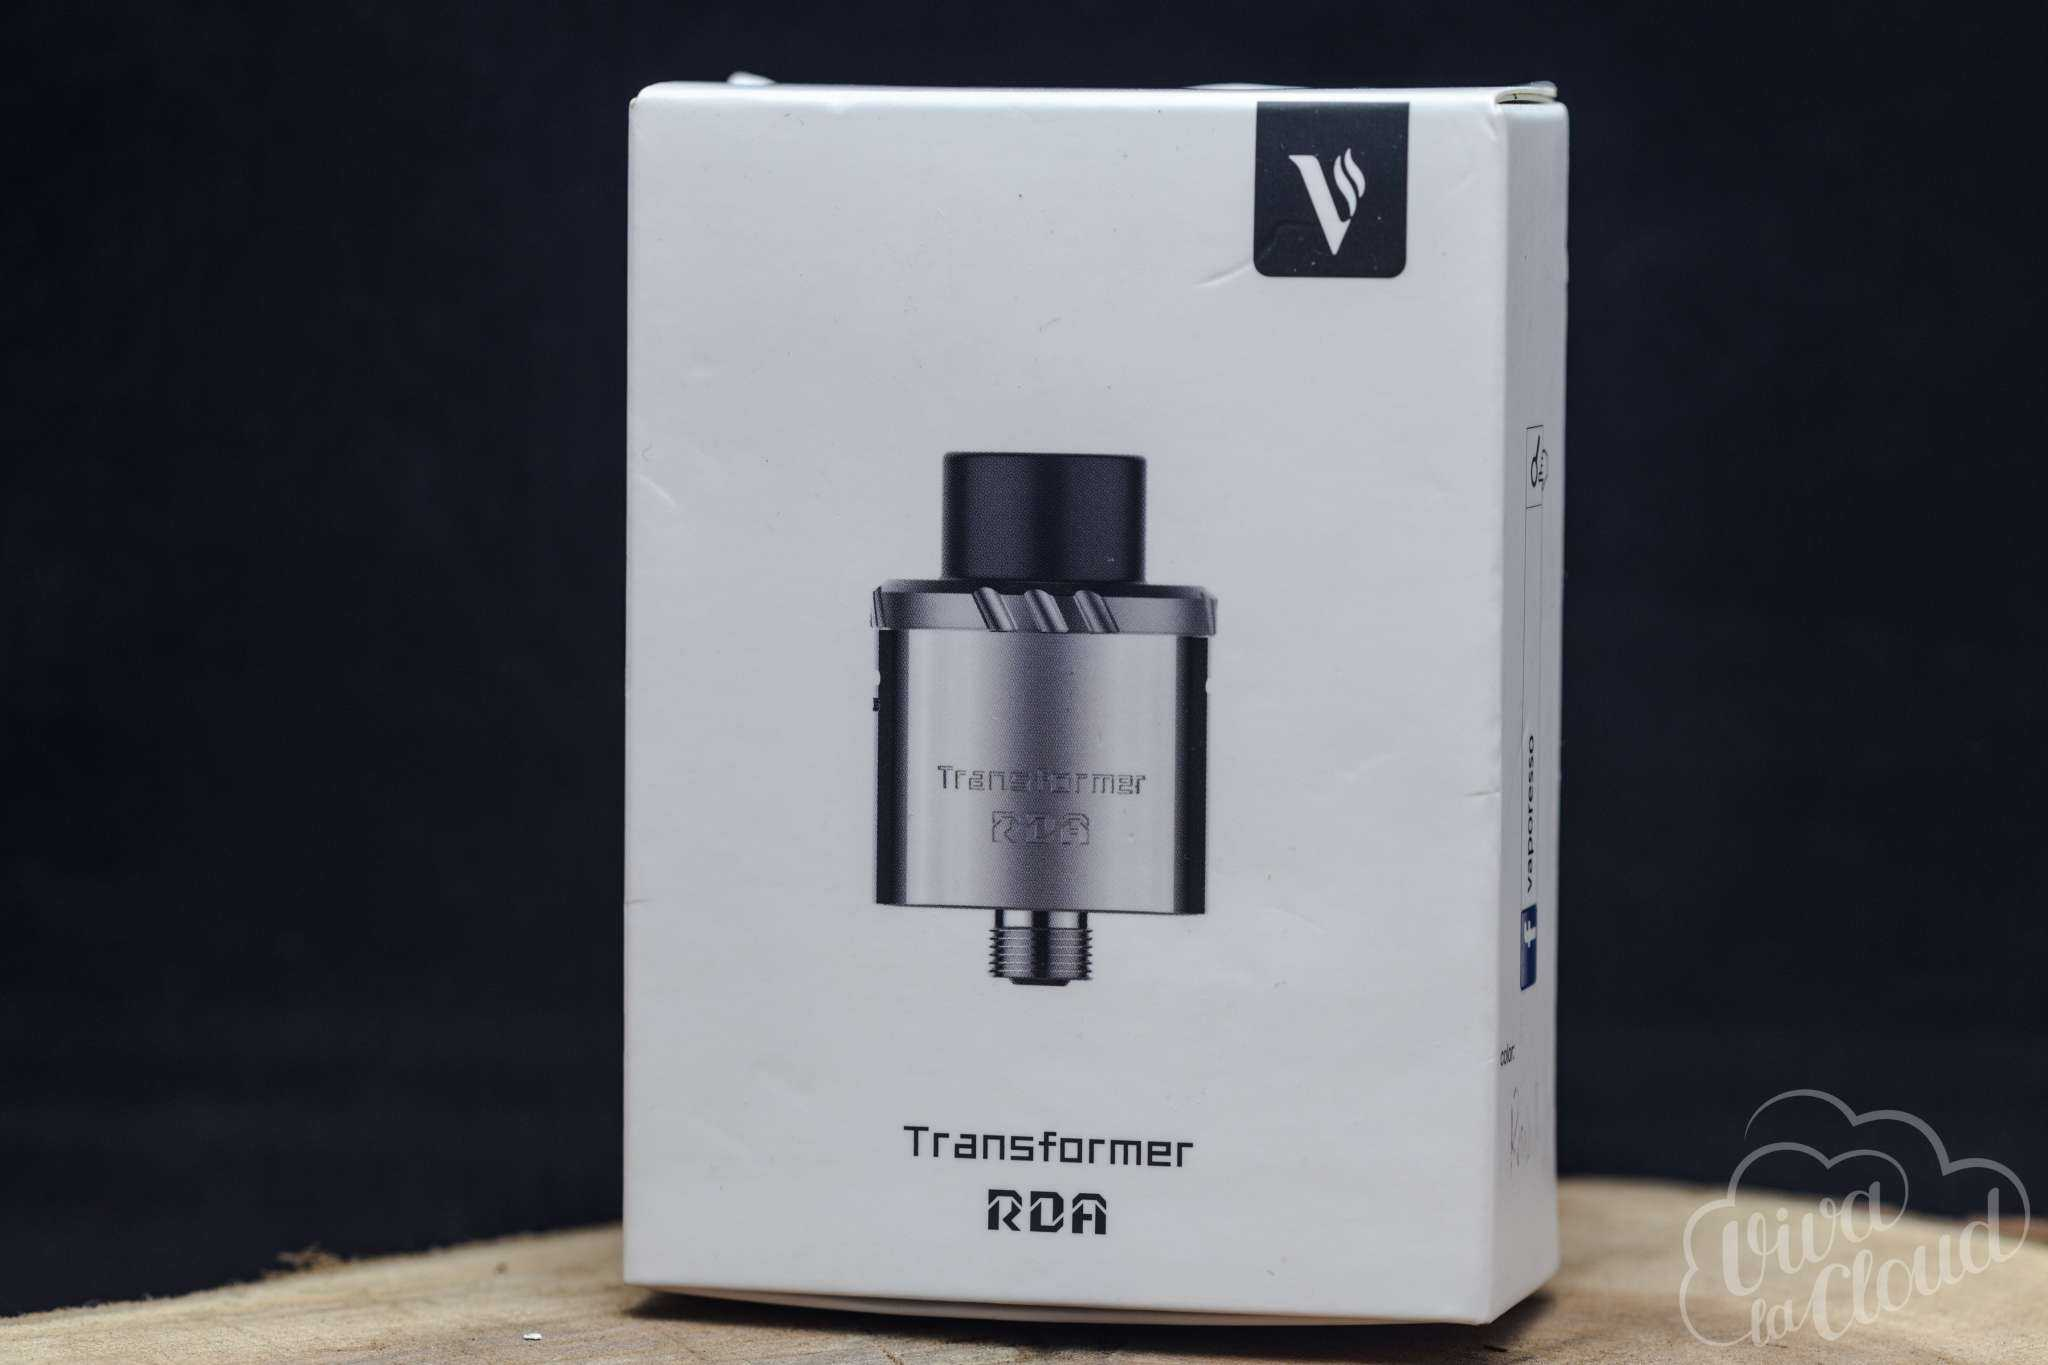 Transformer RDA